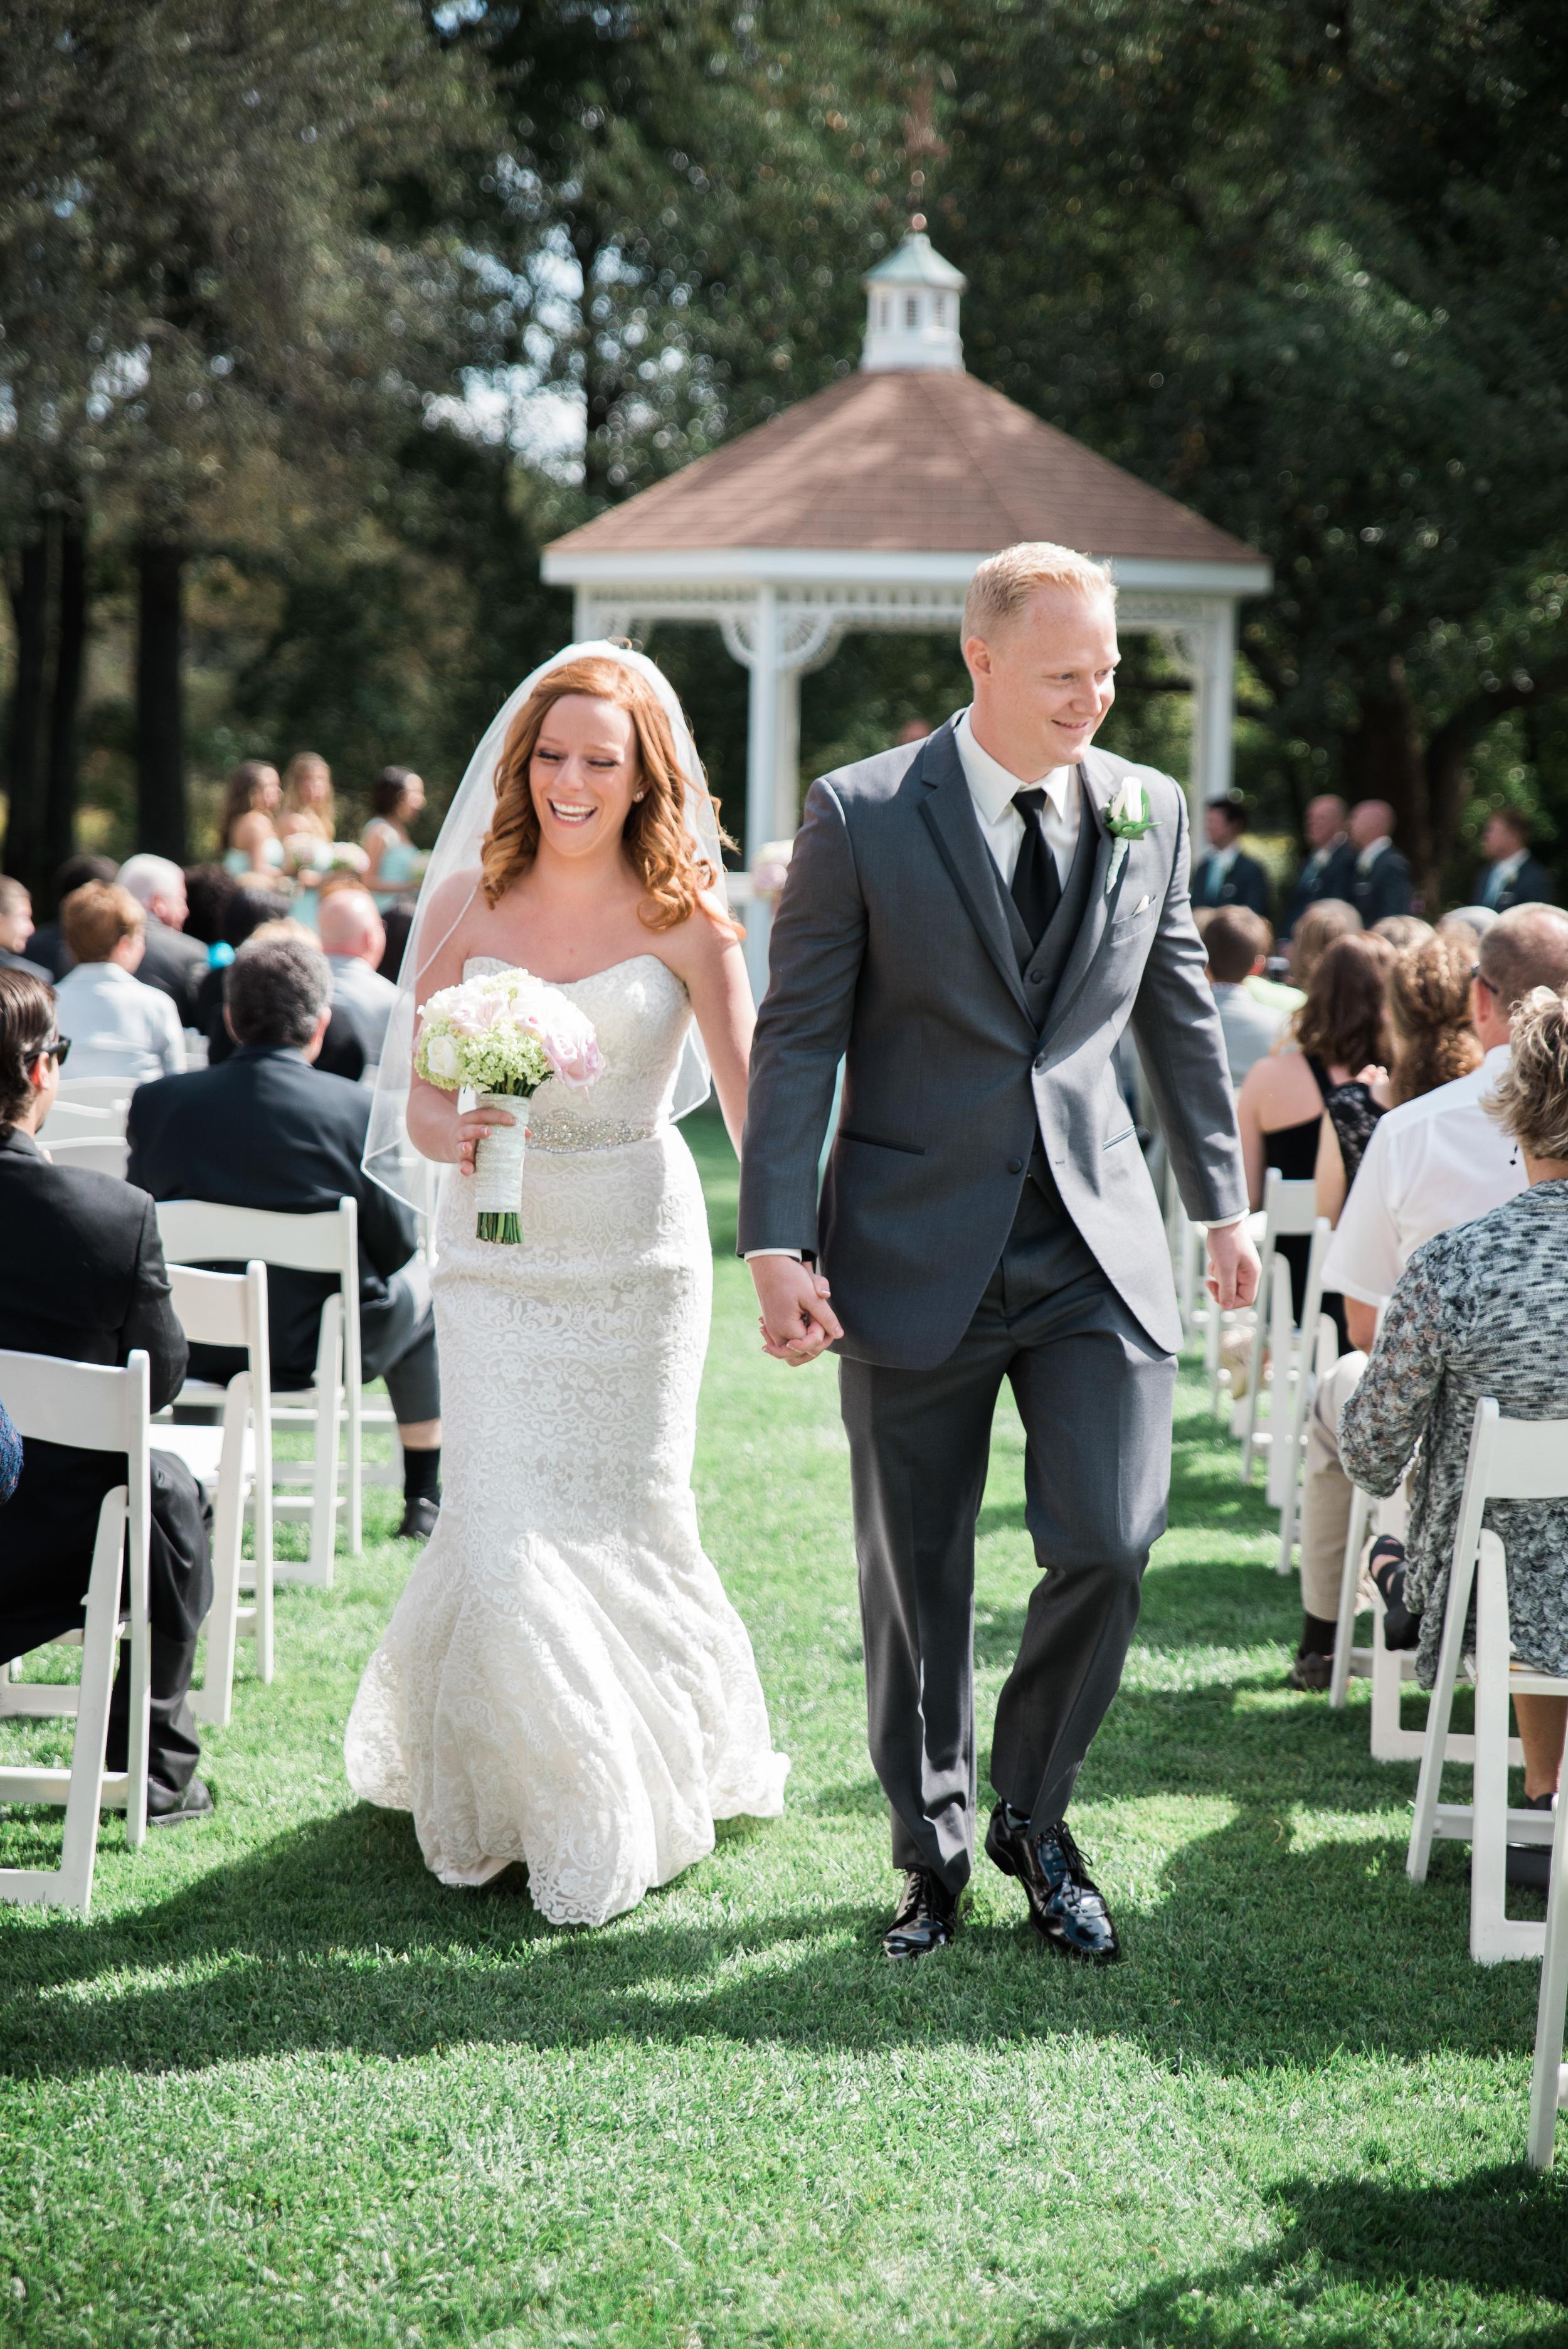 house of lubold photograph weddings-16.jpg